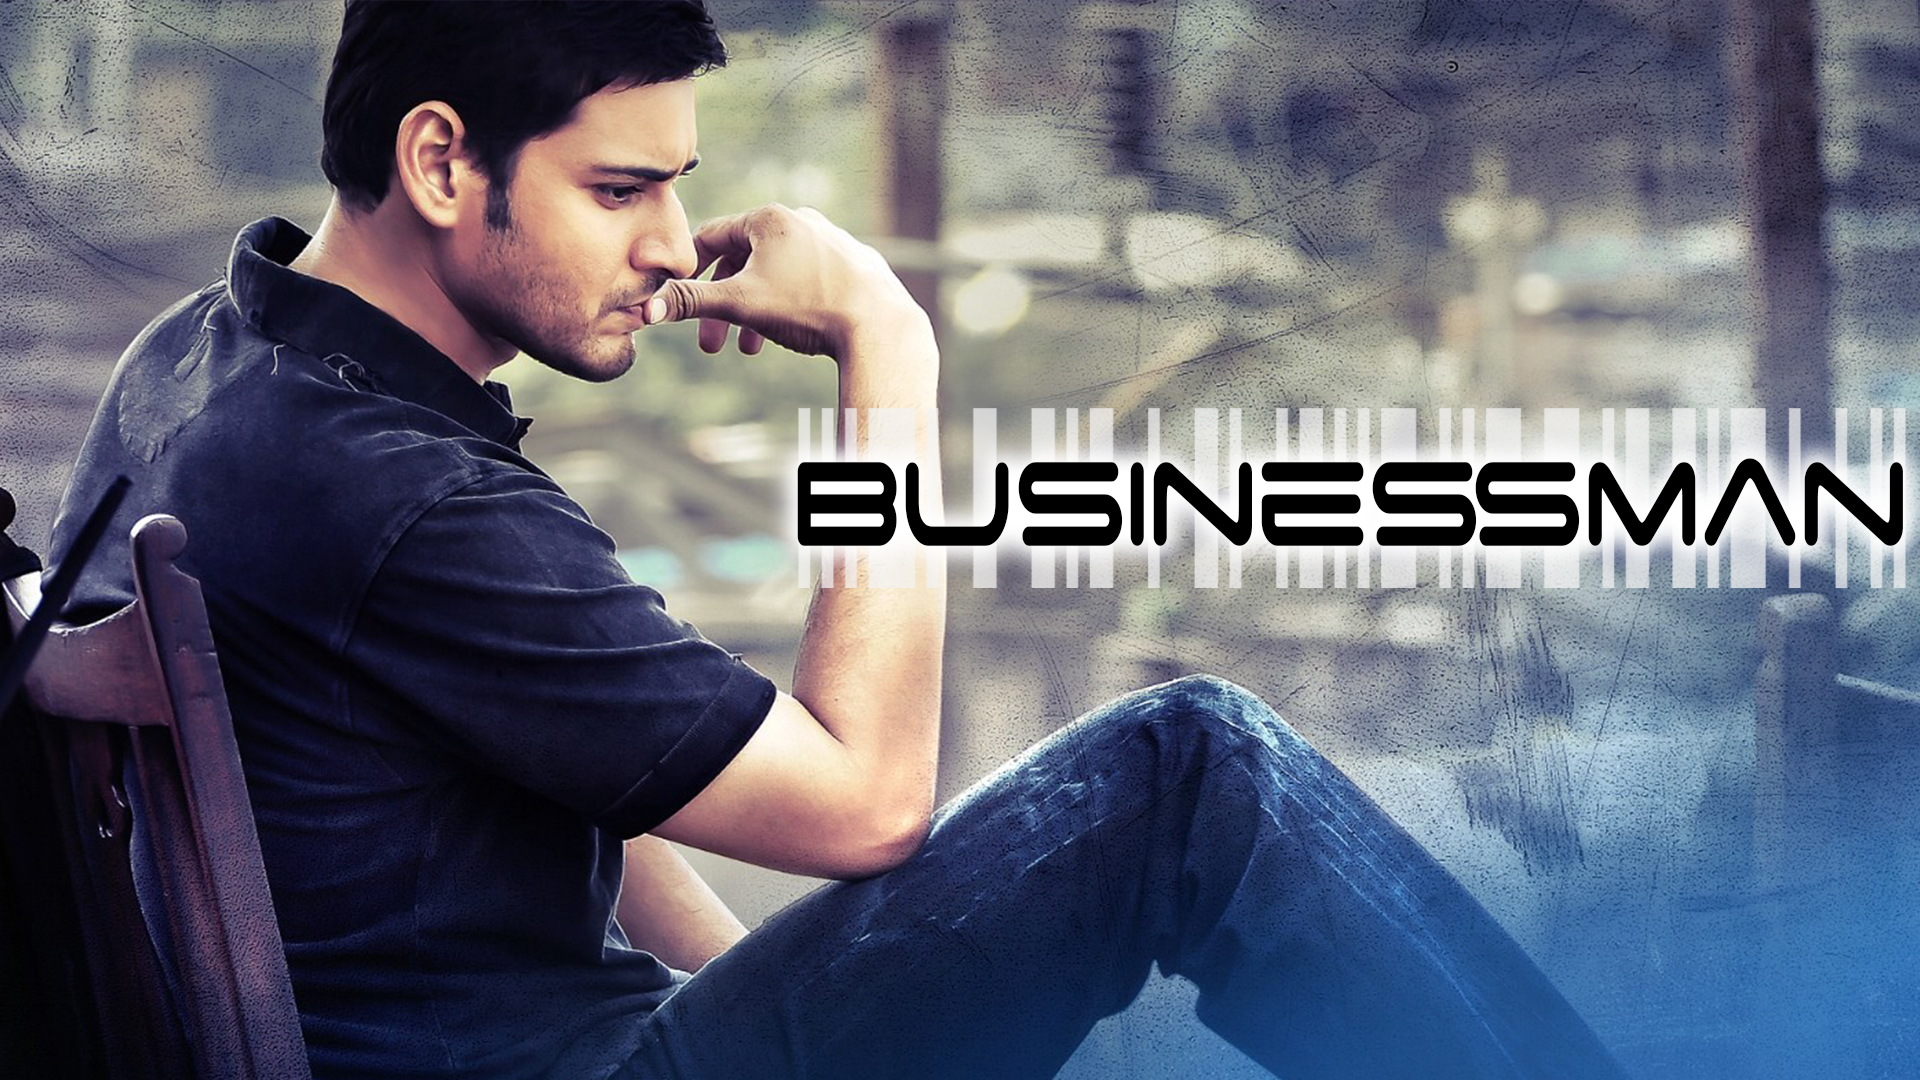 Watch Businessman | Prime Video